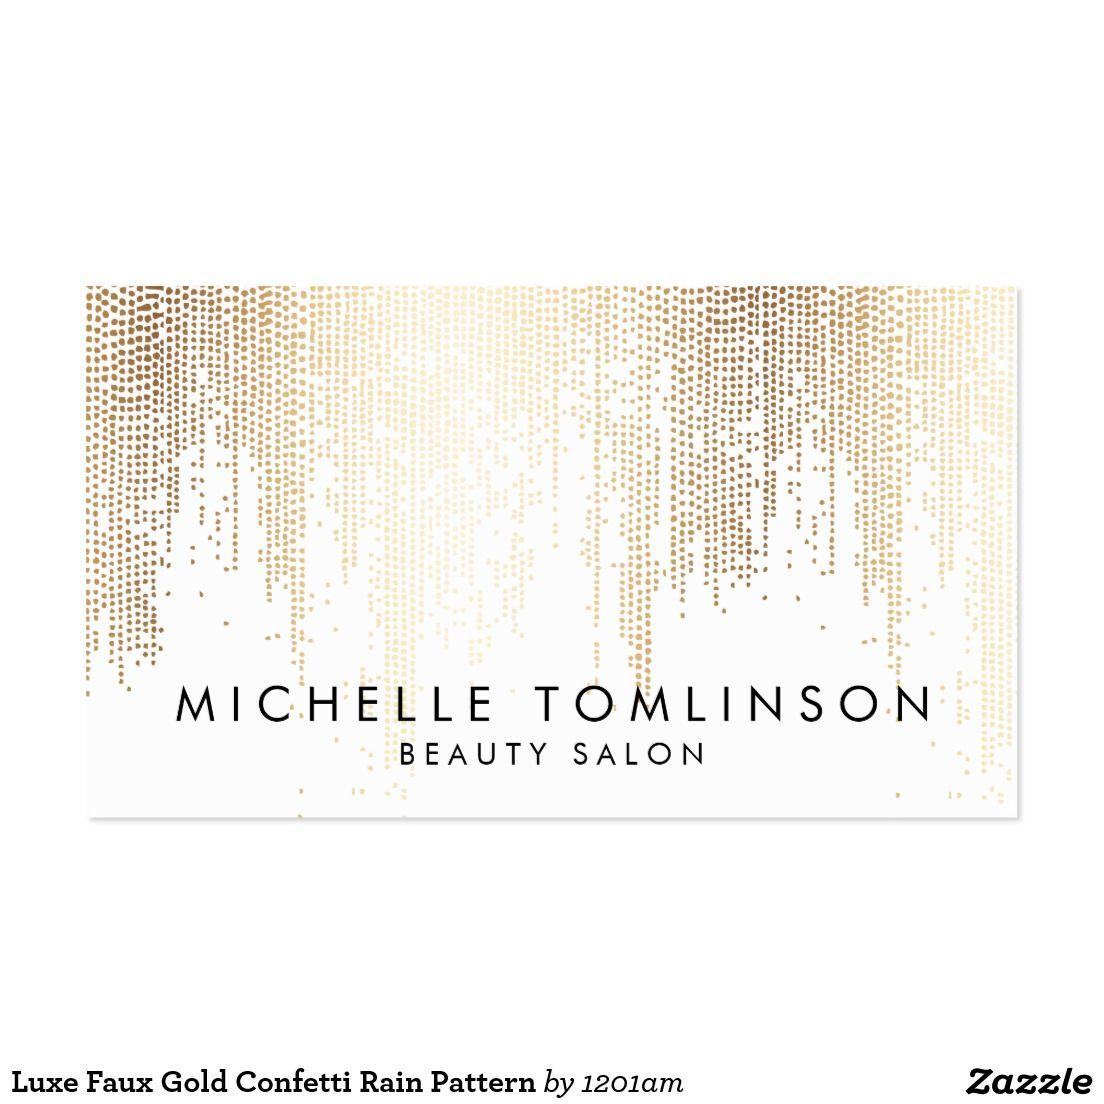 Luxe faux gold confetti rain pattern business card gold confetti luxe faux gold confetti rain pattern business card magicingreecefo Images